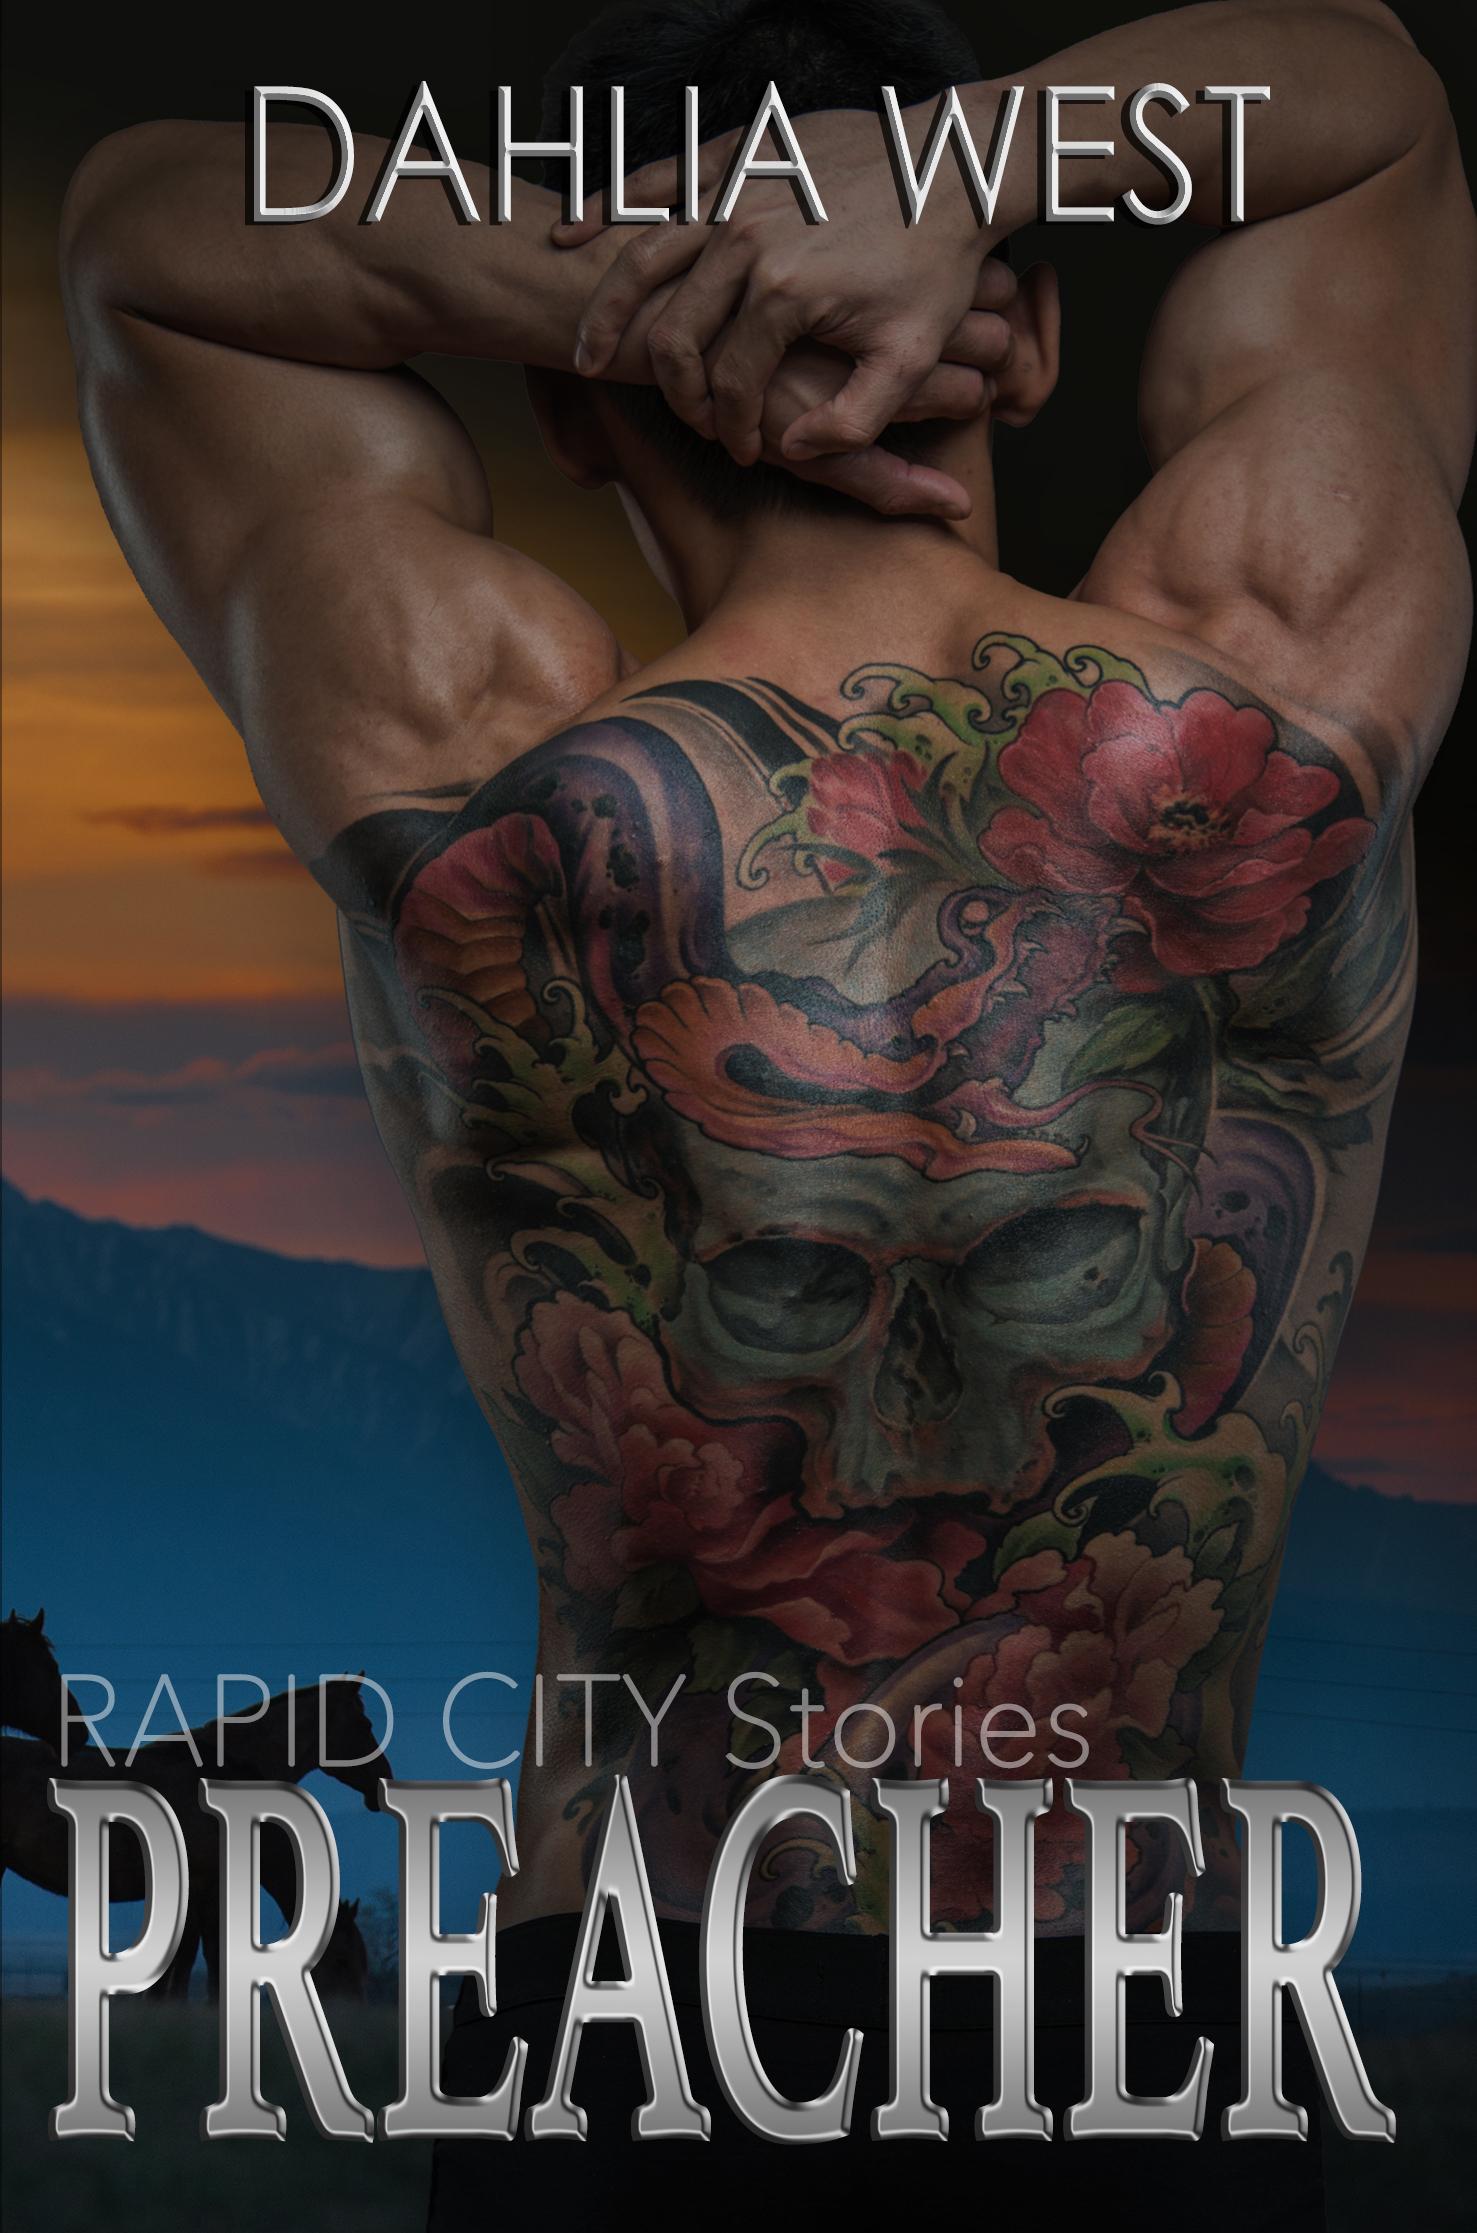 Preacher (Rapid City Stories, #1)  by  Dahlia West